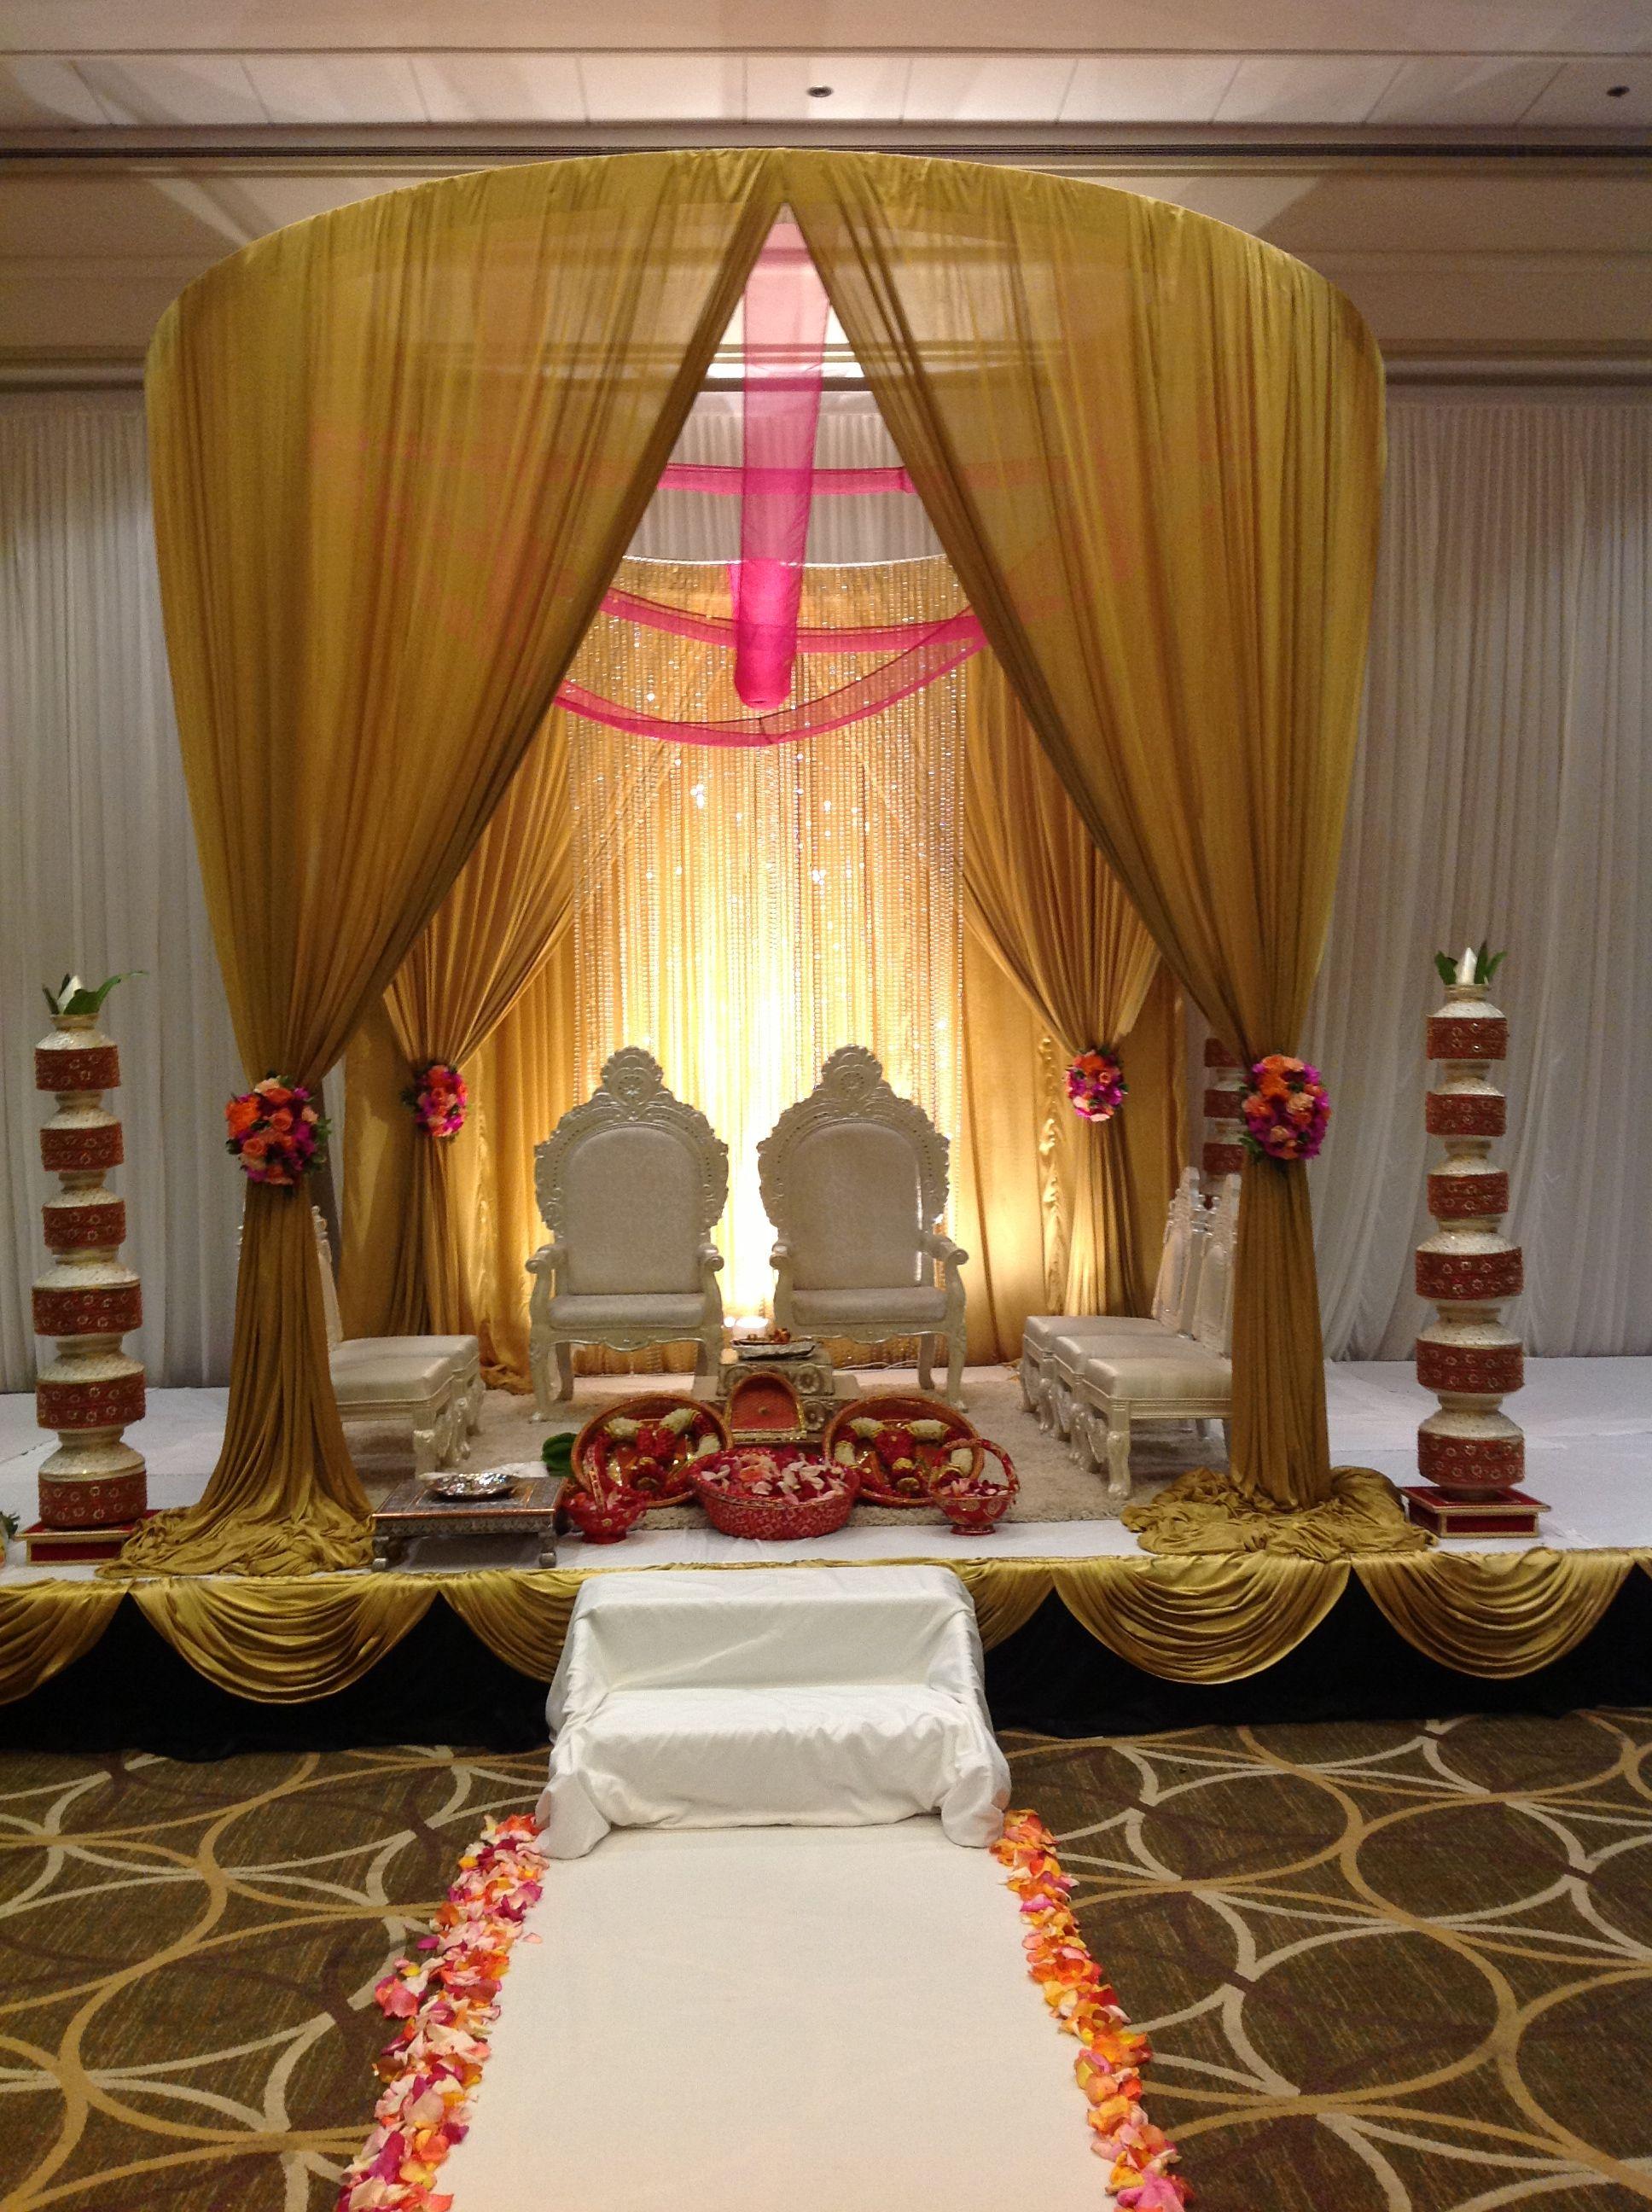 Indian Wedding Mandap Decor Gold And Pink Created By Alankar